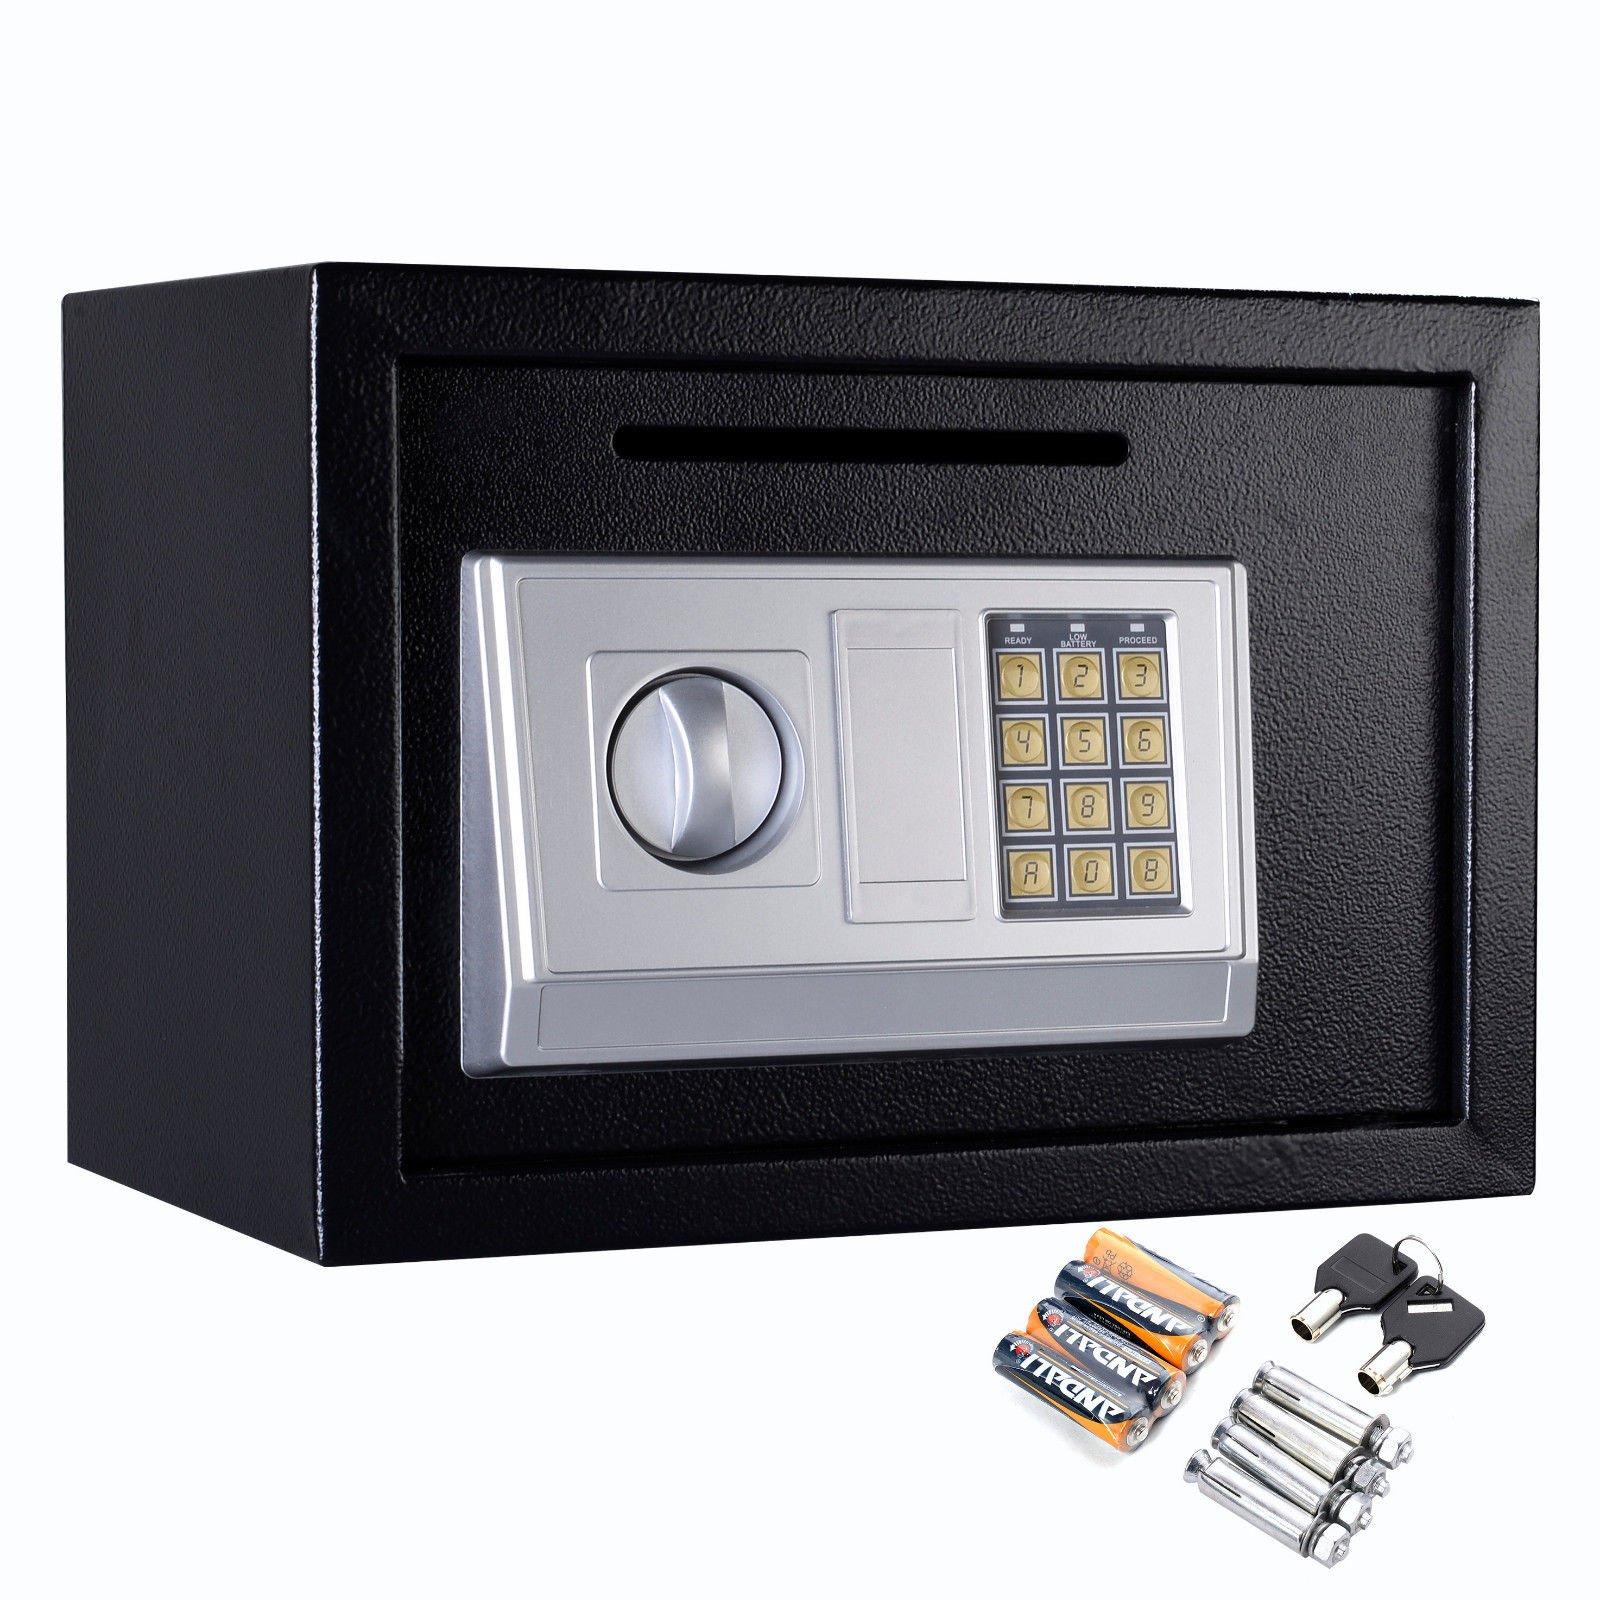 Safstar Electronic Digital Security Keypad Lock Box Home Office Hotel Safe Business Jewelry Cash Money Gun Cabinet (13.8'' x 10'' x 10'')